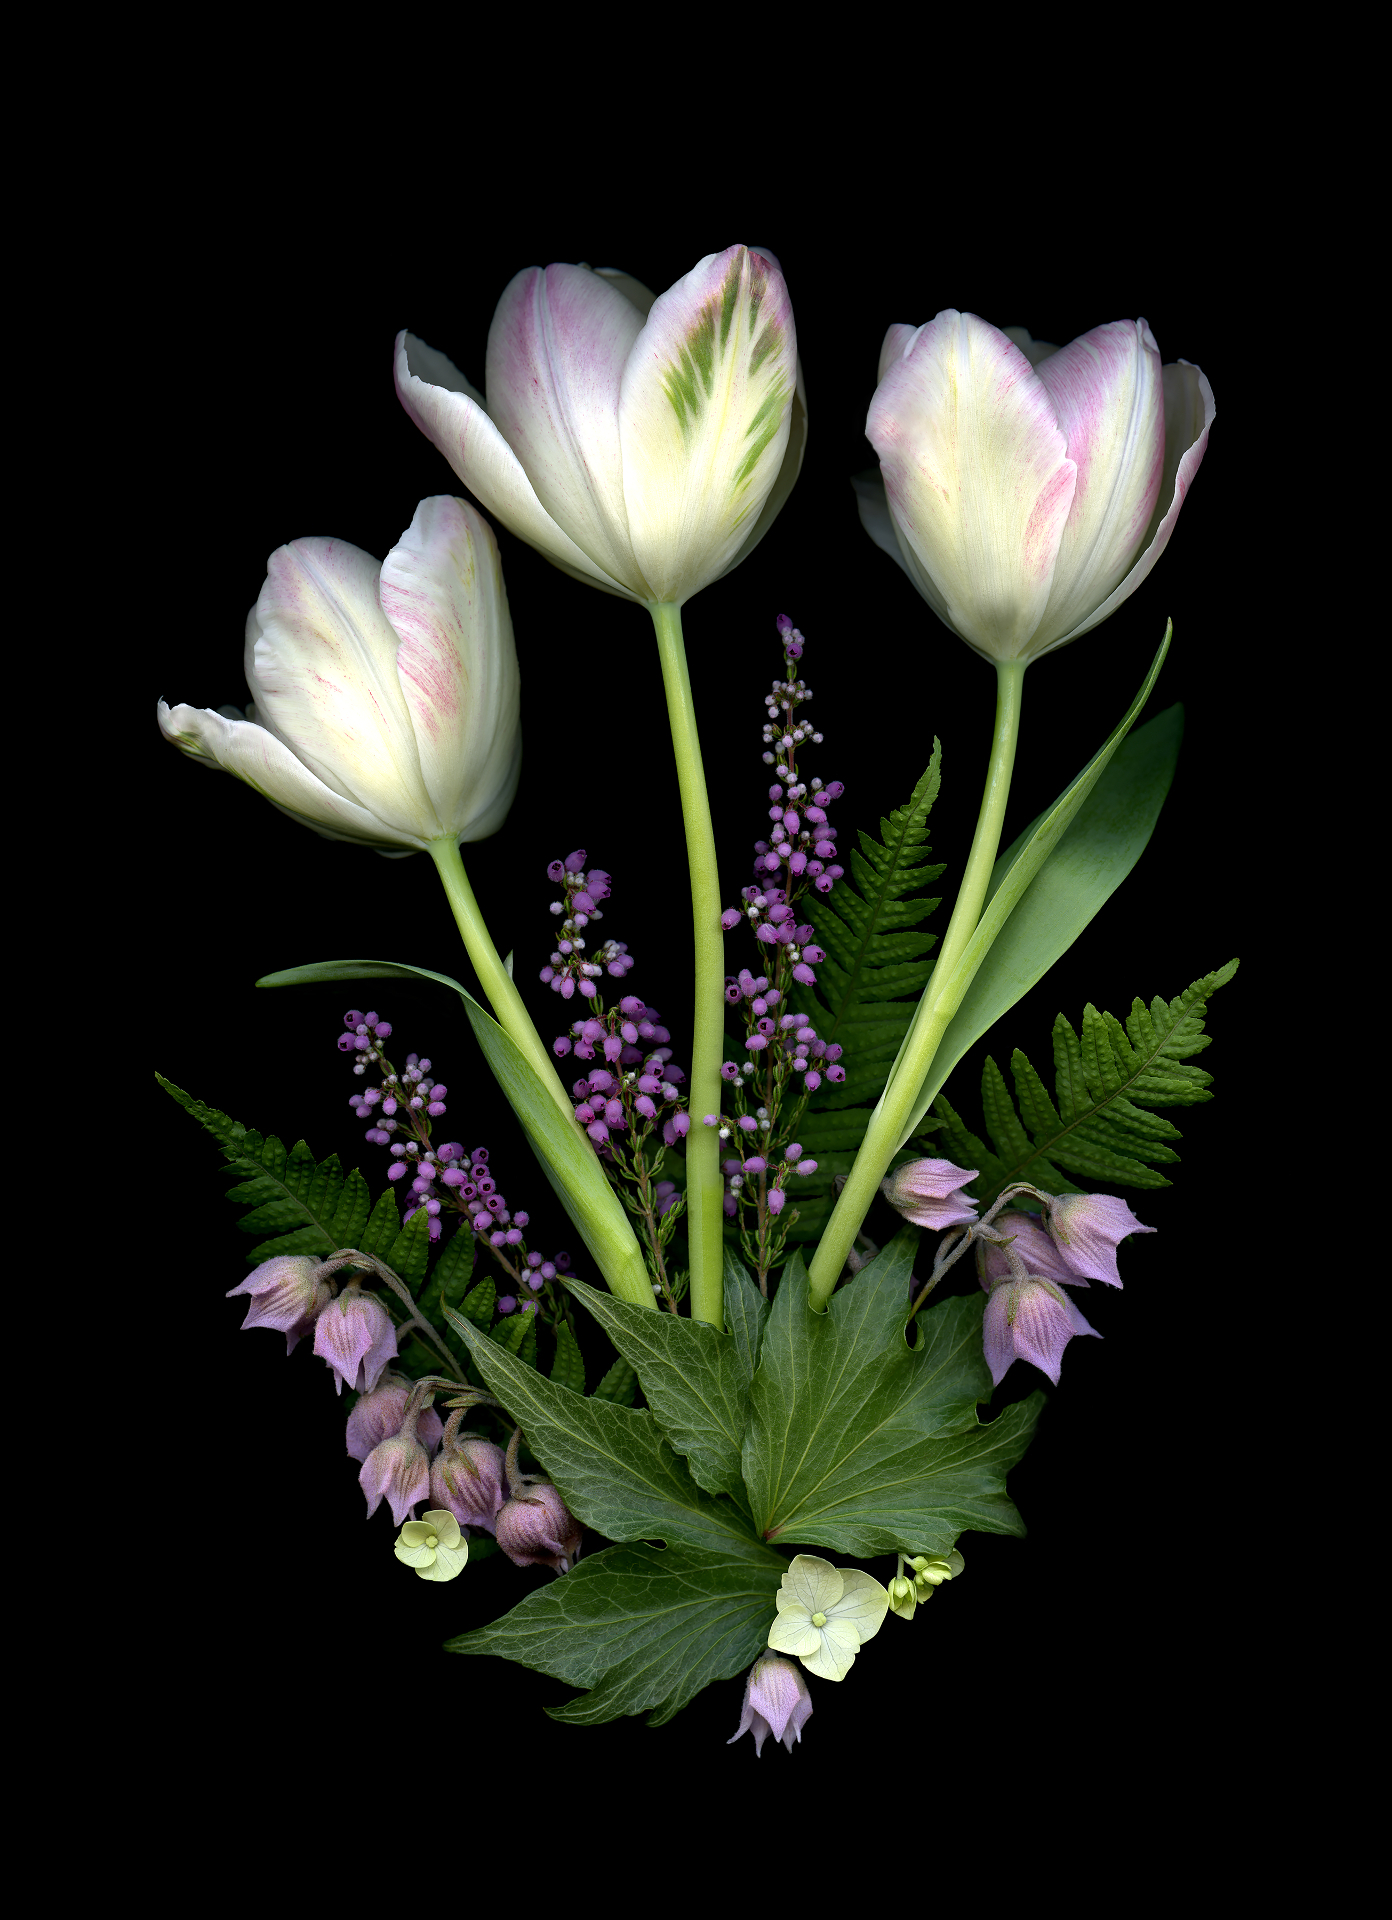 Flower Composition 11